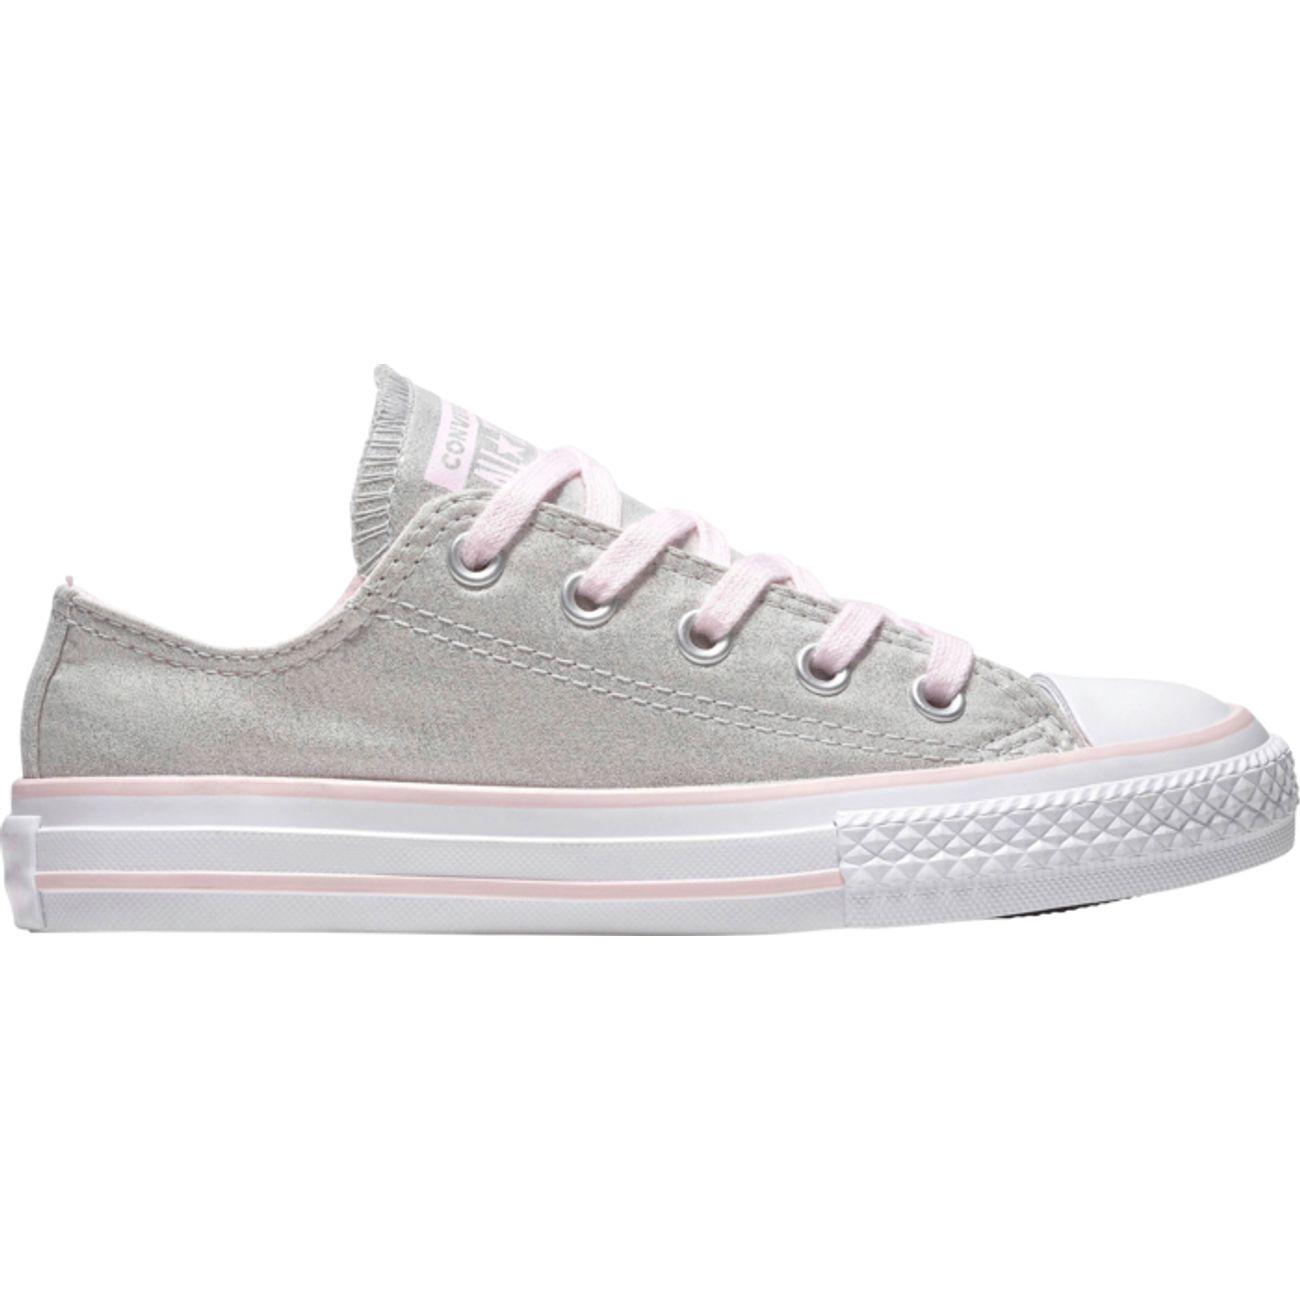 Converse Chaussures Taylor Allstar Loisirs Basses Enfant Chuck Ox P8Okw0nX